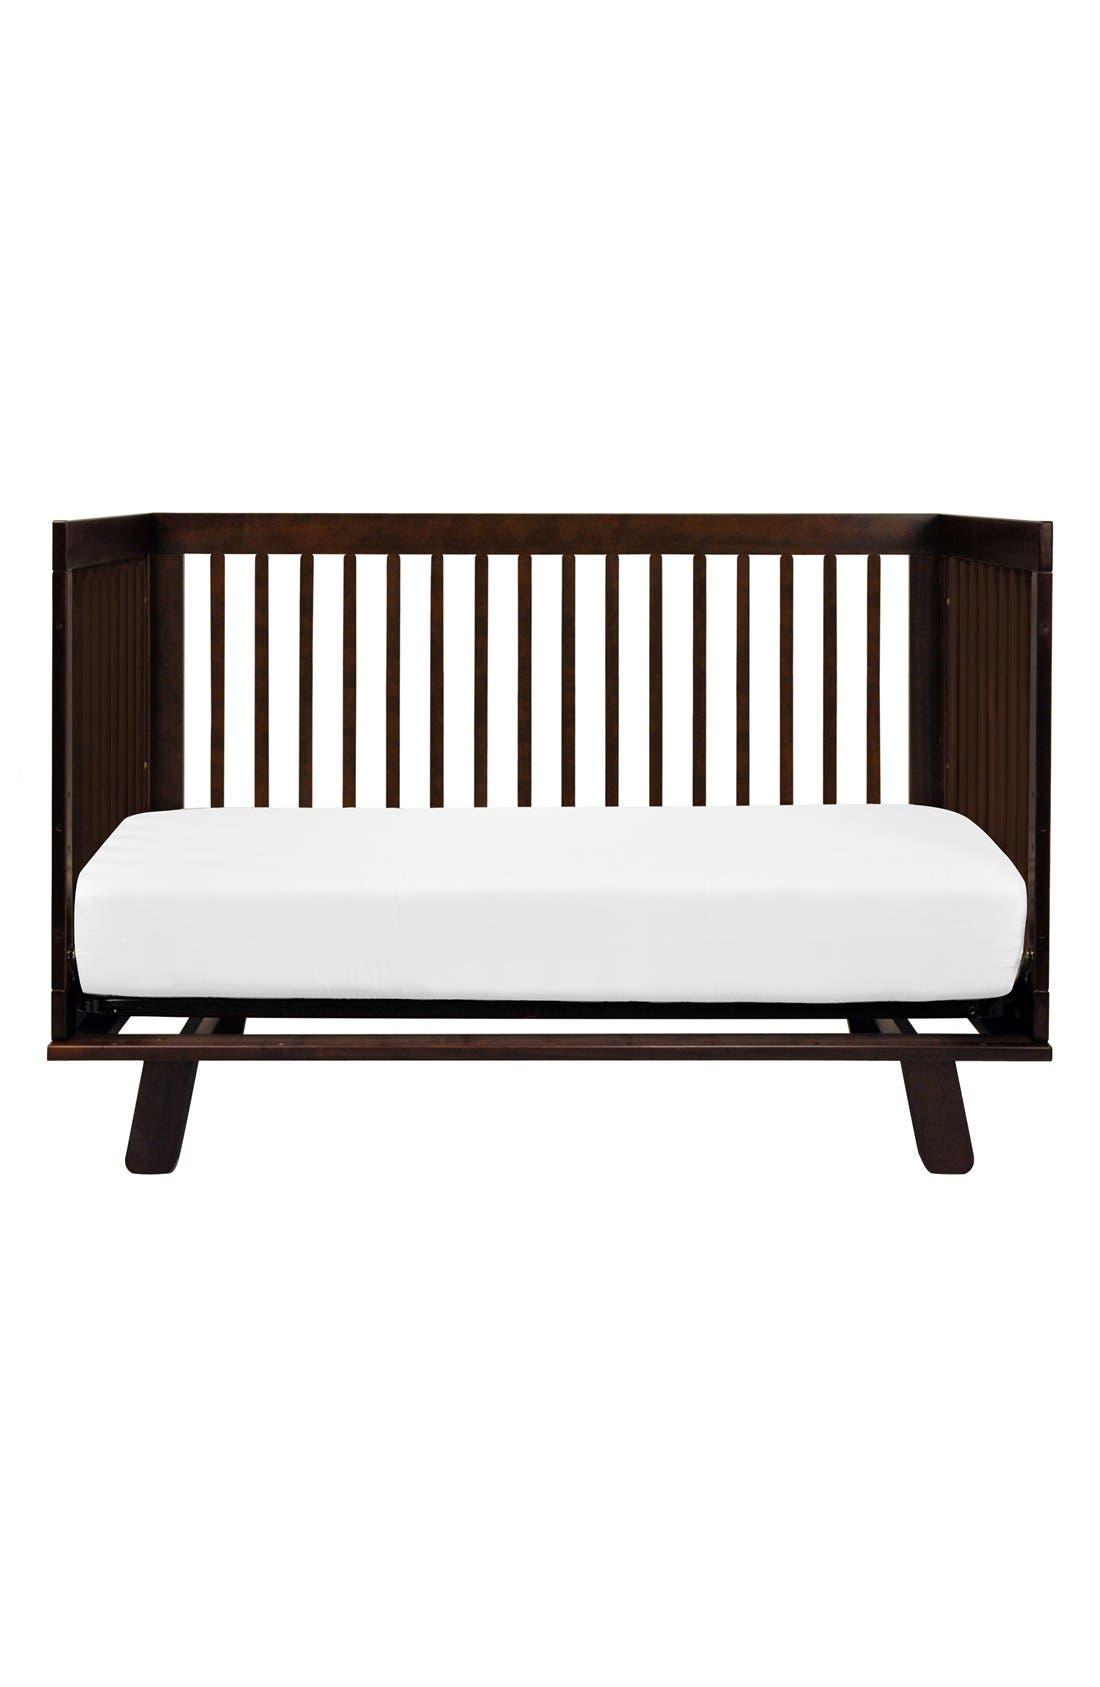 'Hudson' 3-in-1 Convertible Crib,                             Alternate thumbnail 19, color,